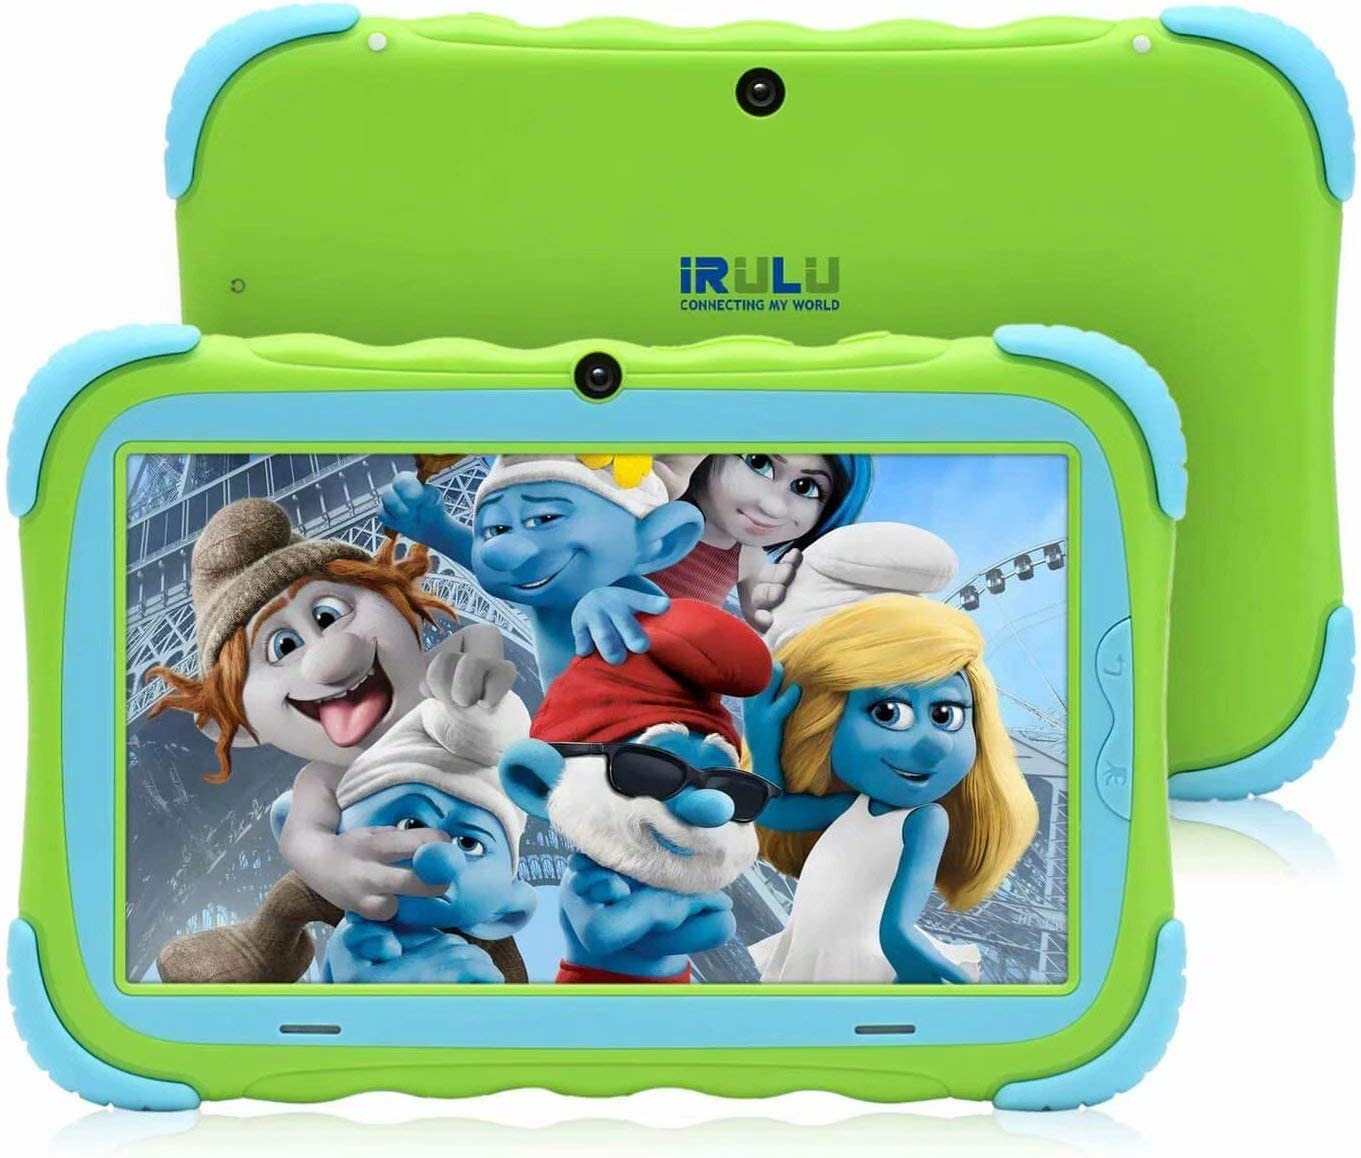 Kinder Tablet, Kindertablet Pad Lerntablet für Kids, 7-Zoll-HD-Touchscreen, Dual Camera, Android OS Bluetooth WiFi für Jungen Mädchen Green